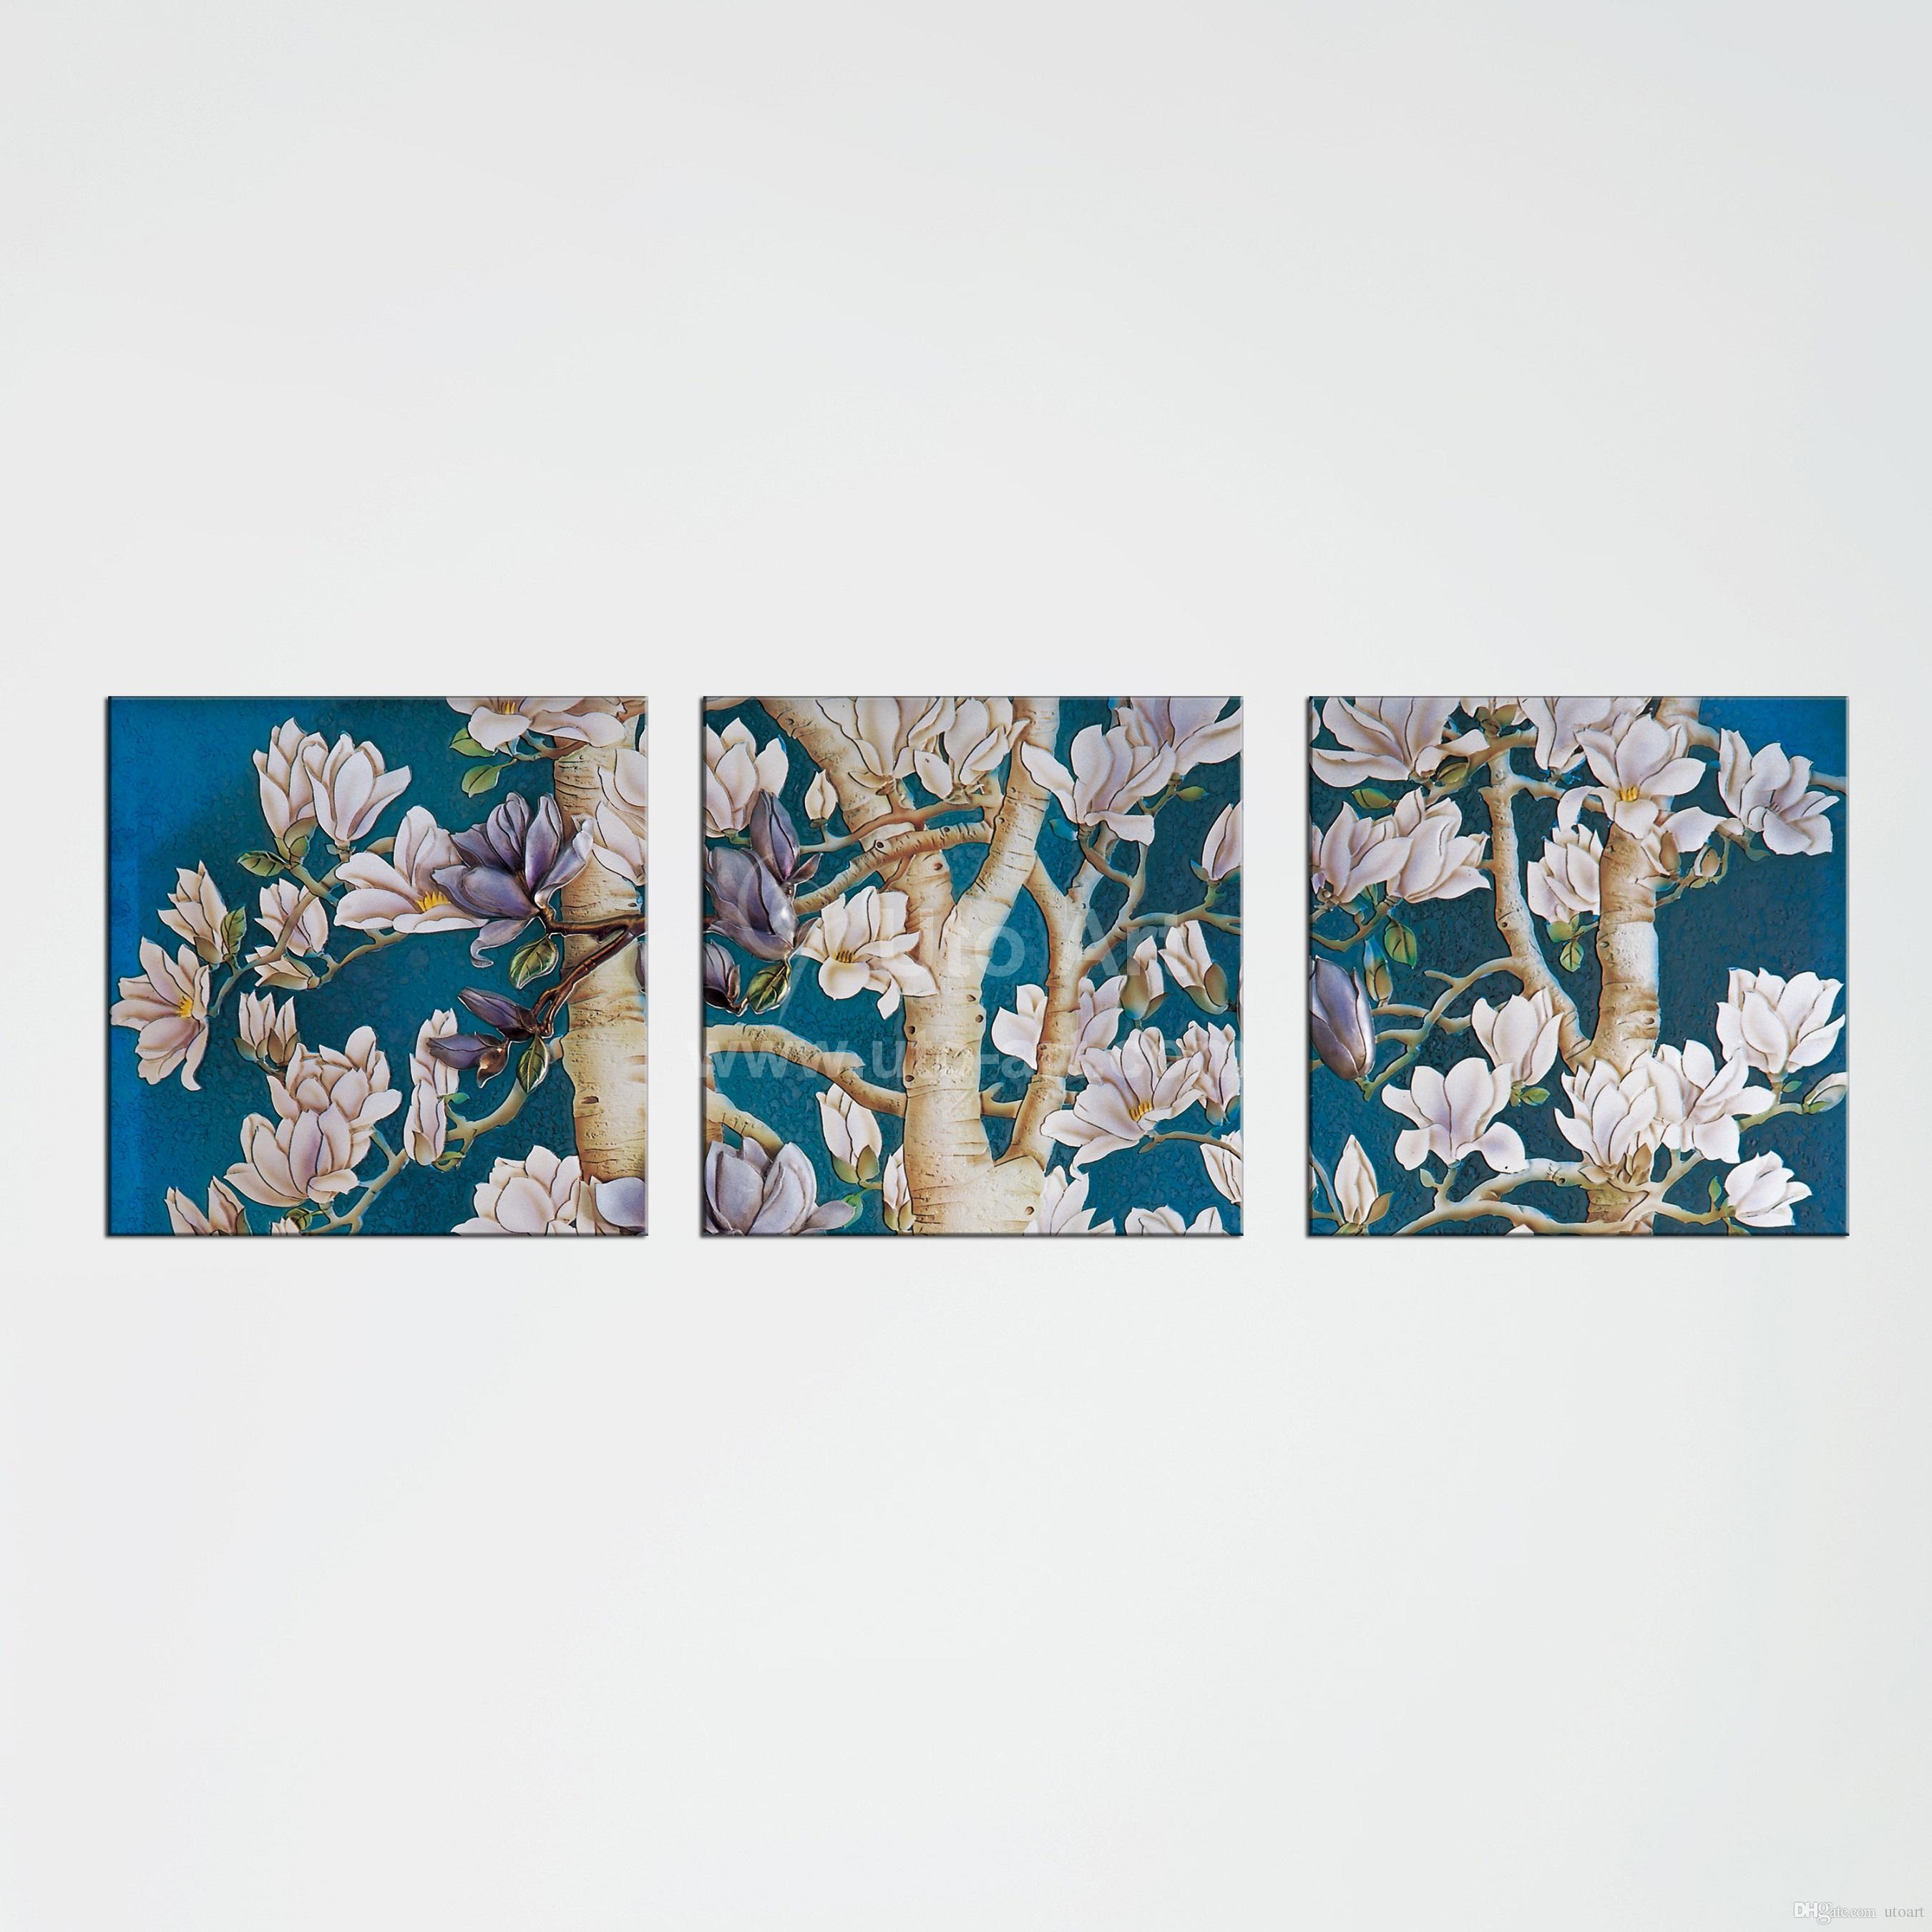 modern home decor canvas painting van gogh apricot flower   - modernhomedecorcanvaspaintingvangogh